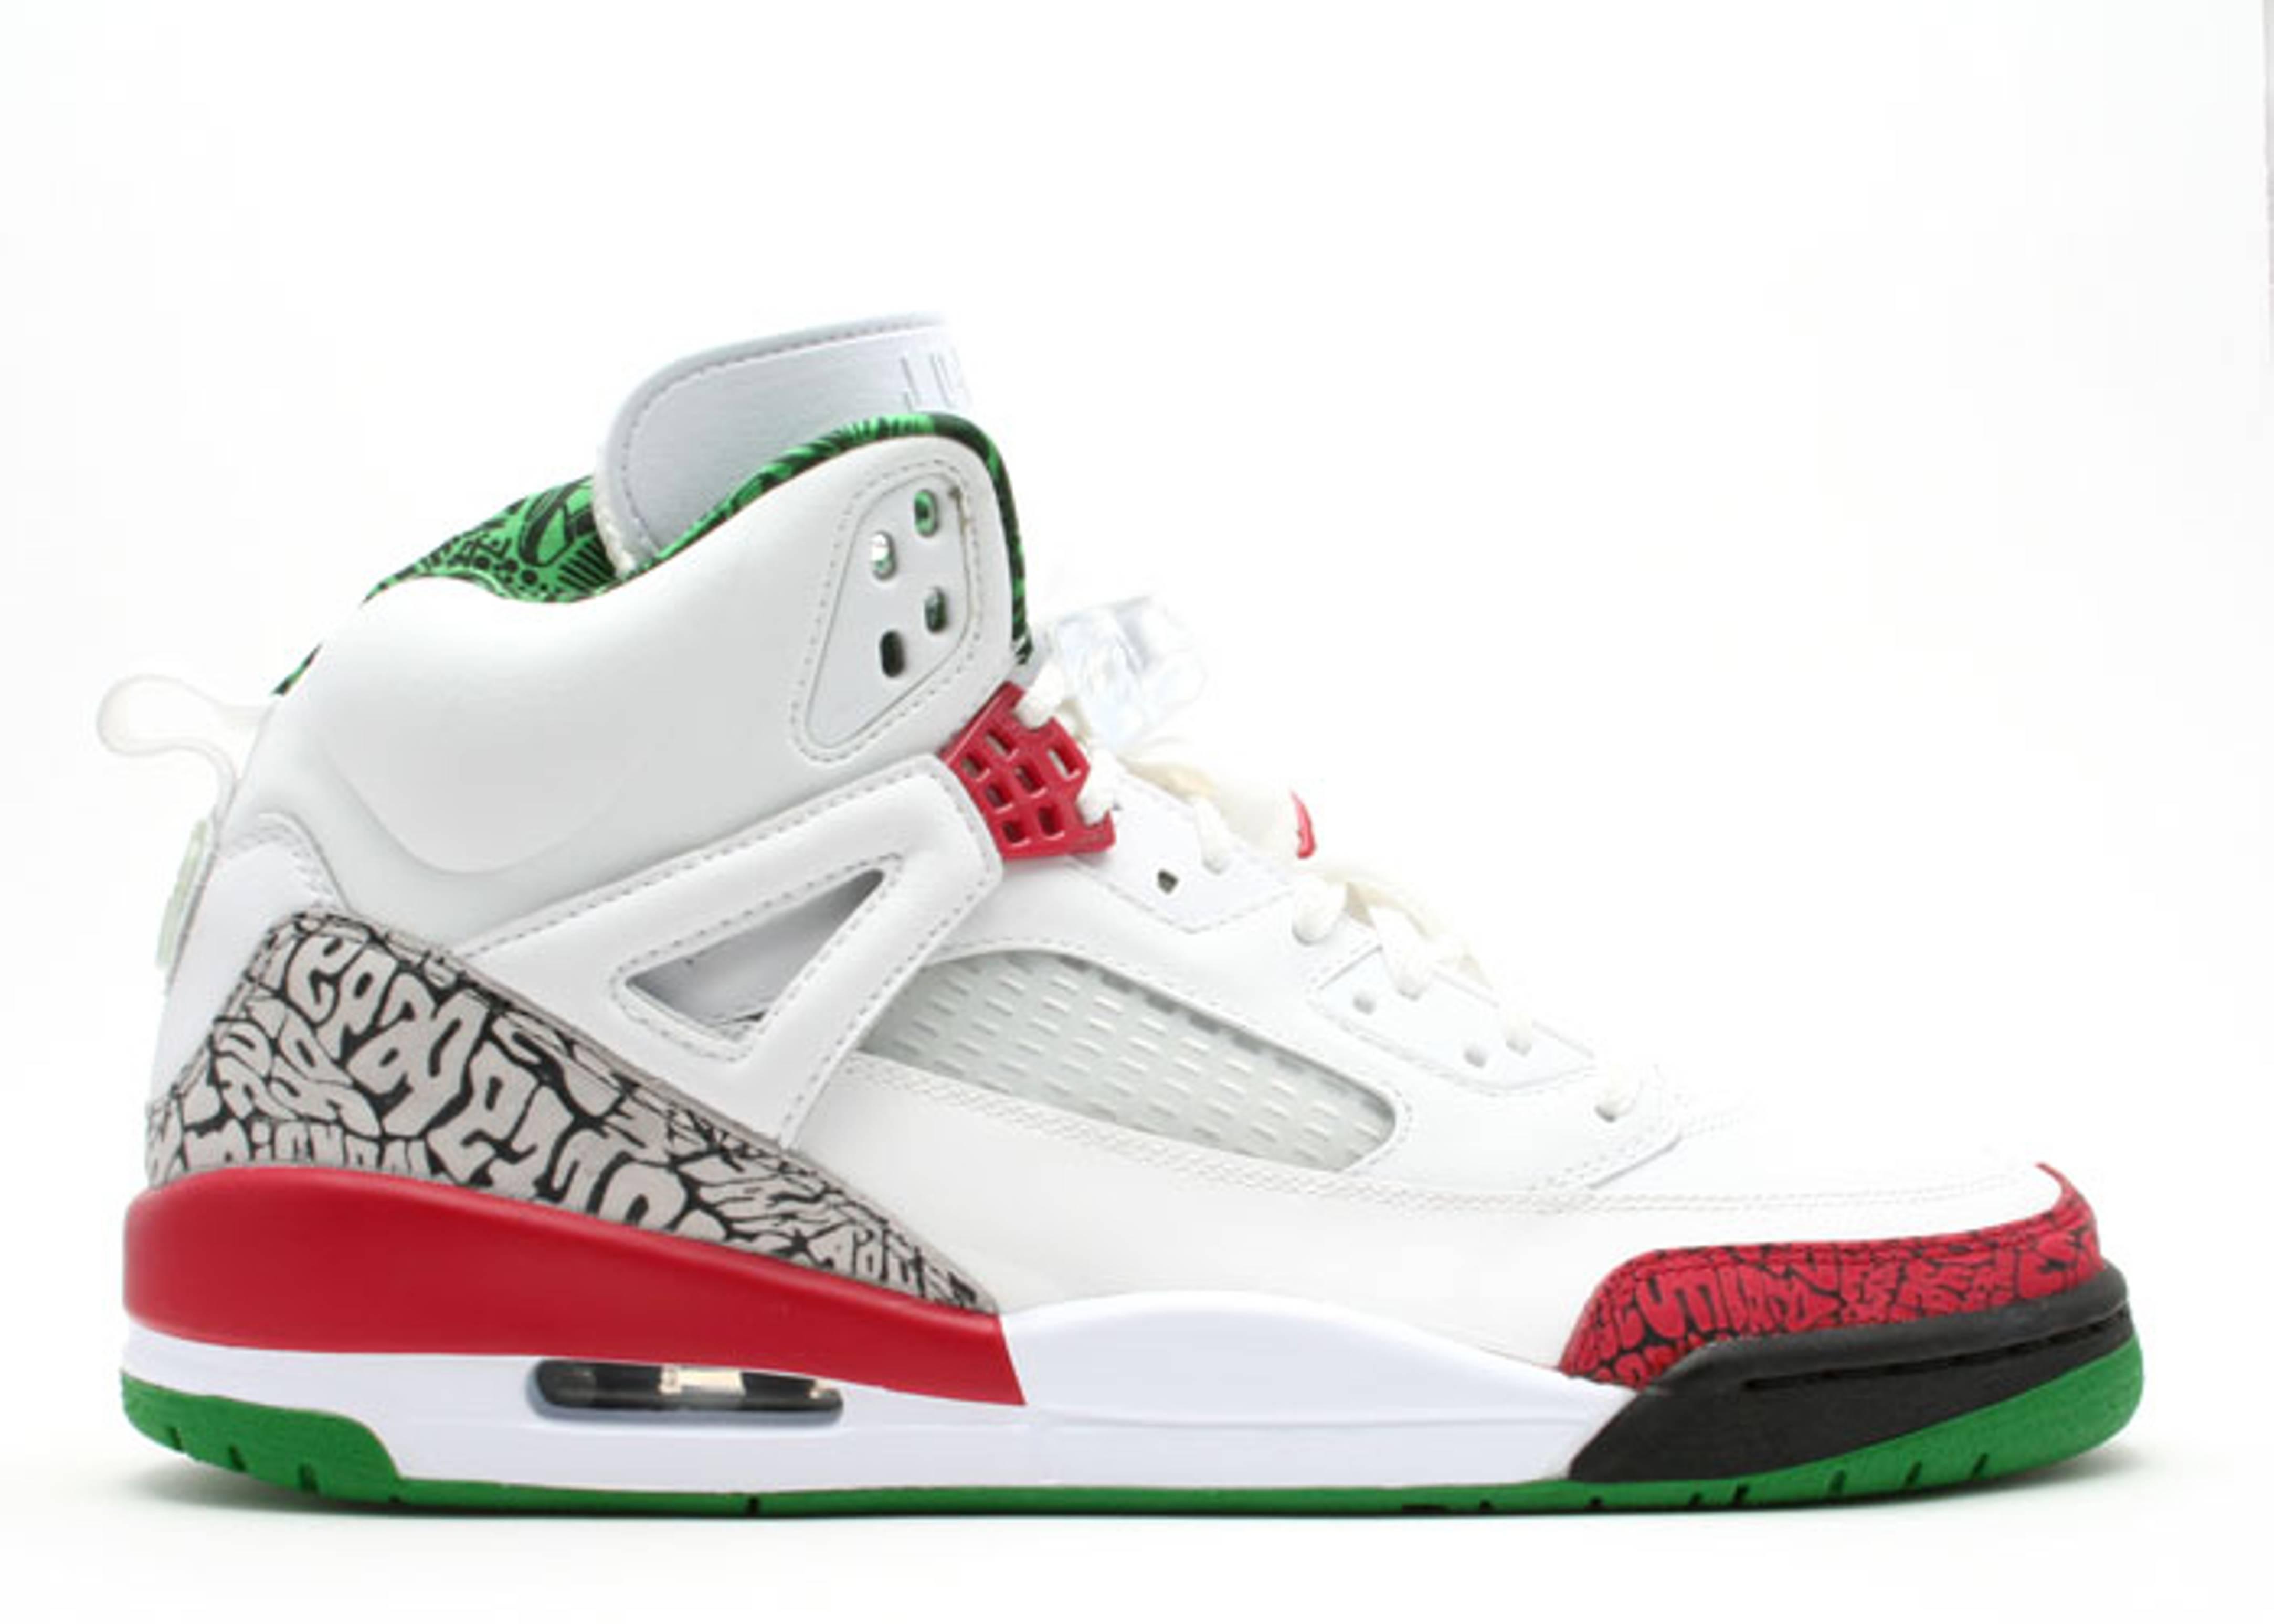 ffbbbf97dc6b Jordan Spizike Gray Green Pink Nike Air Jordan X Retro Cool Grey ...